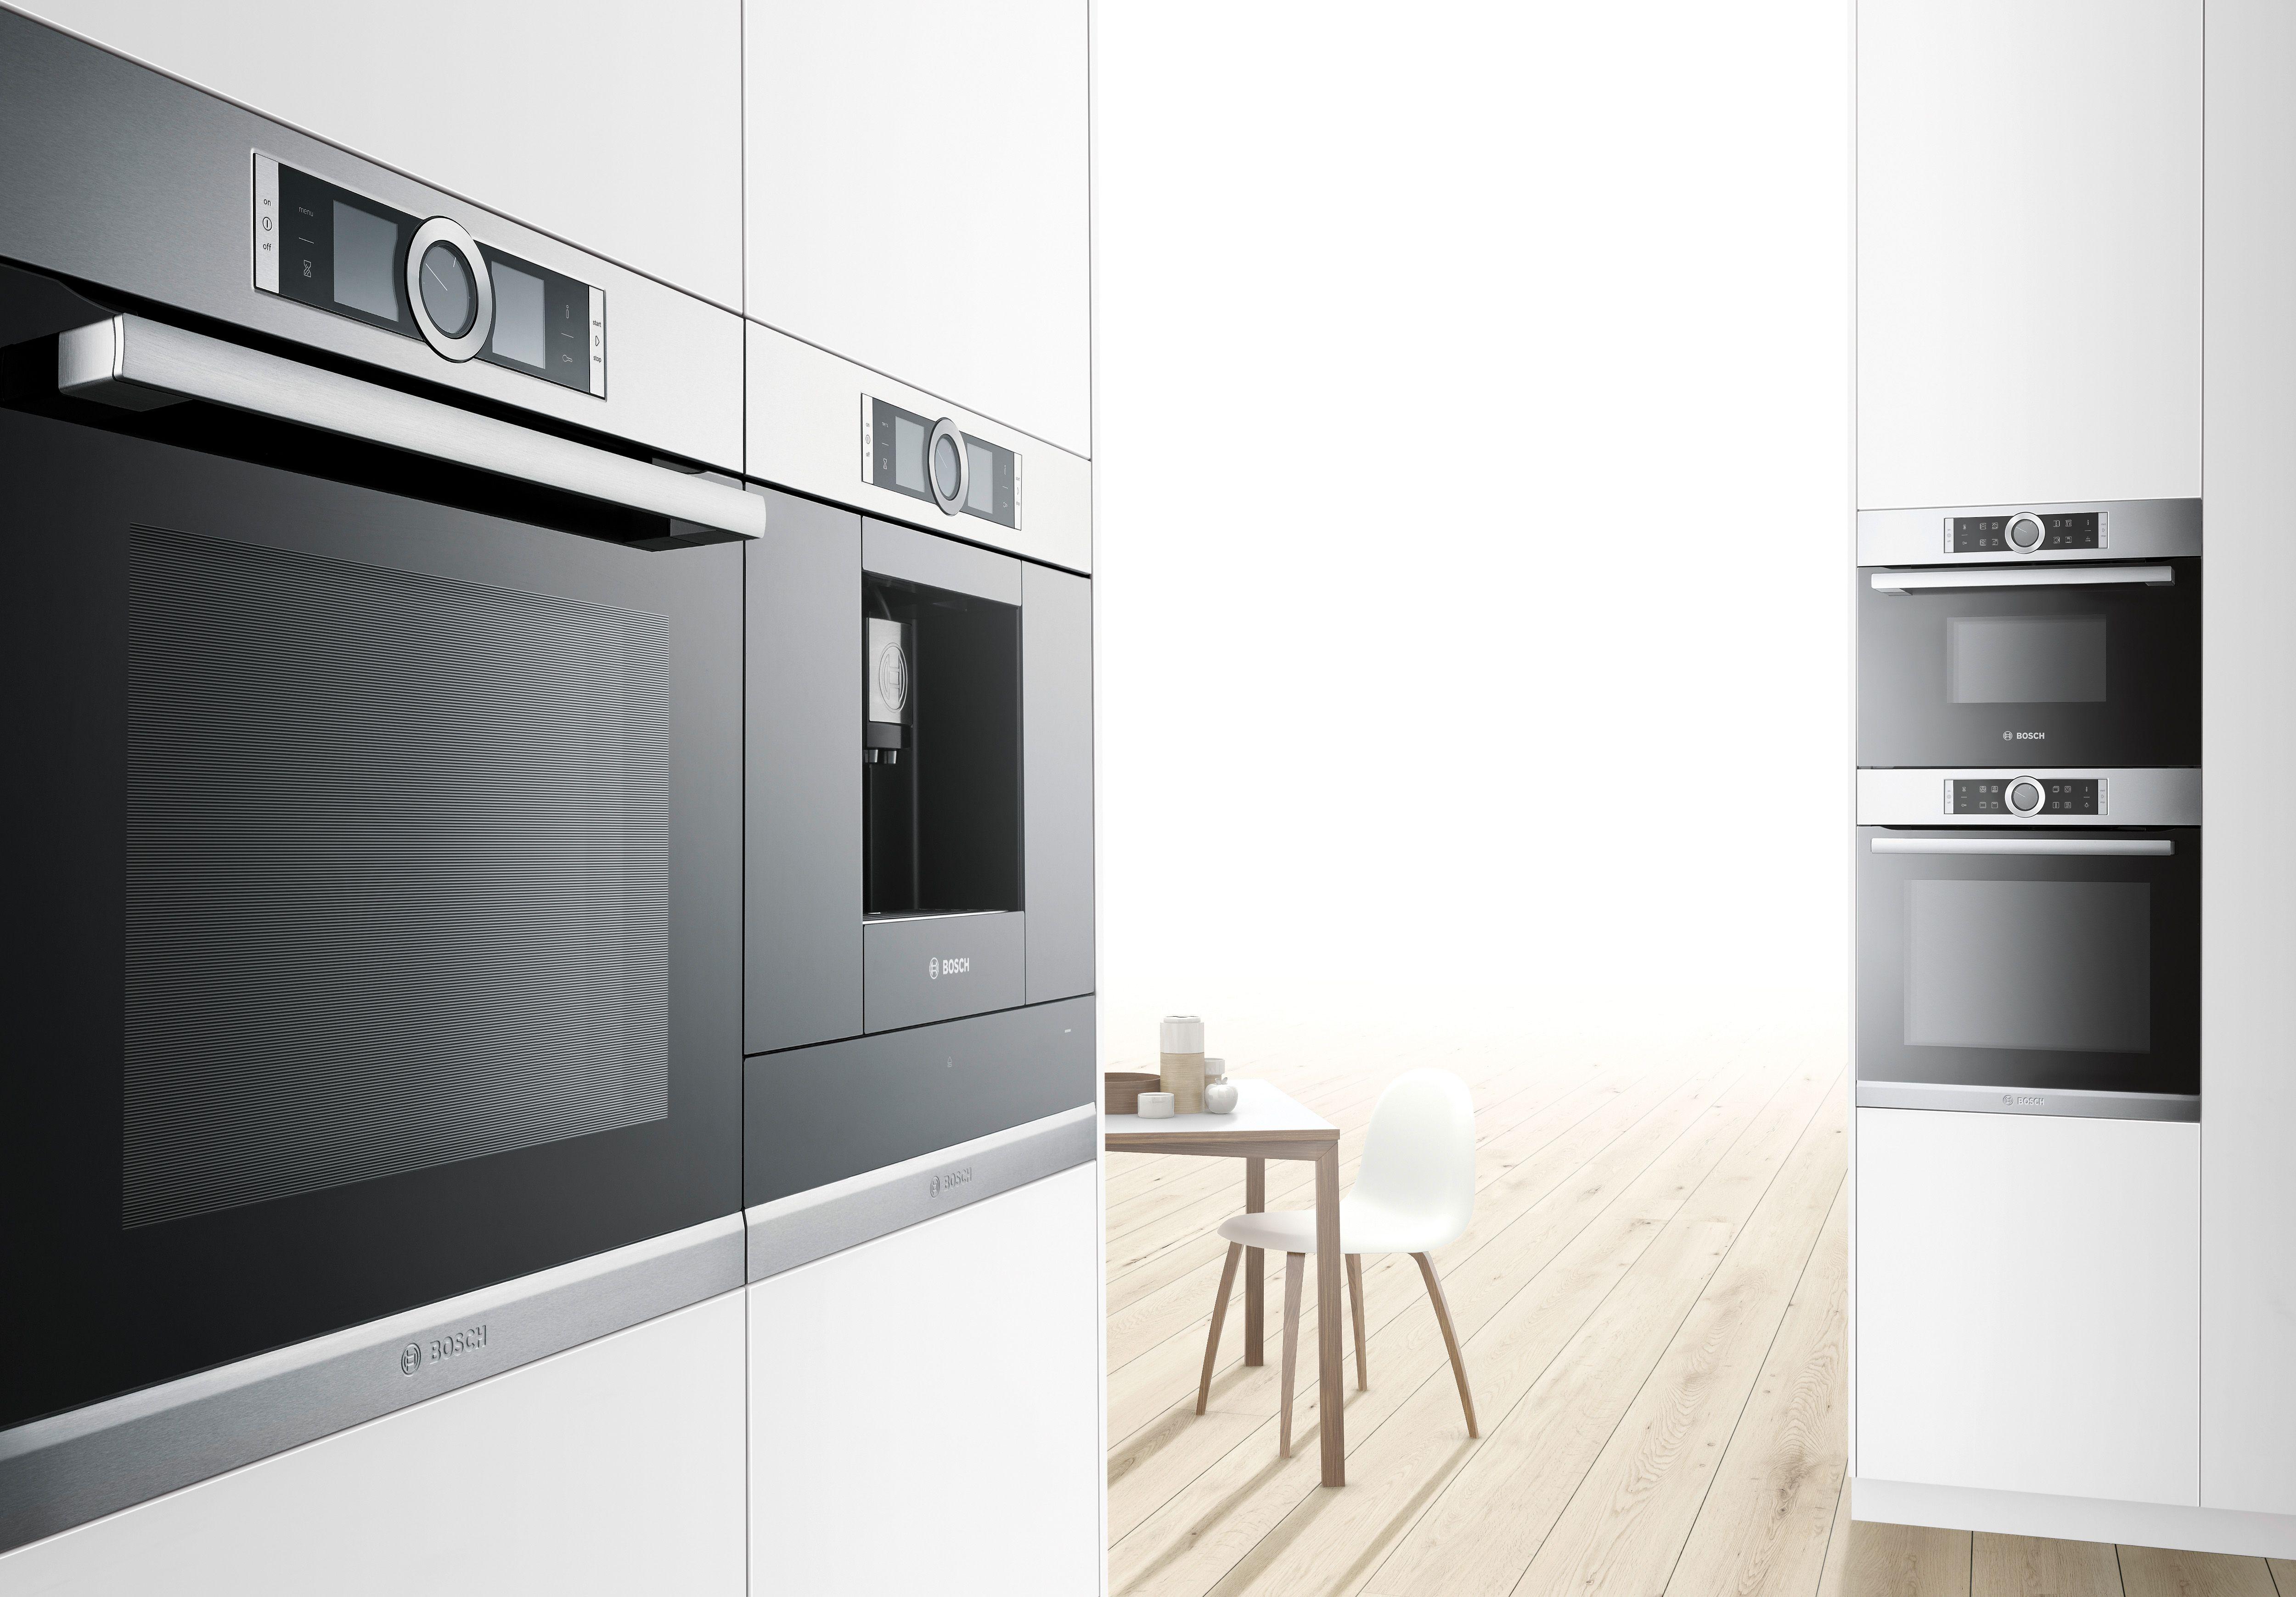 23 best built-in kitchen appliances images on pinterest | kitchen